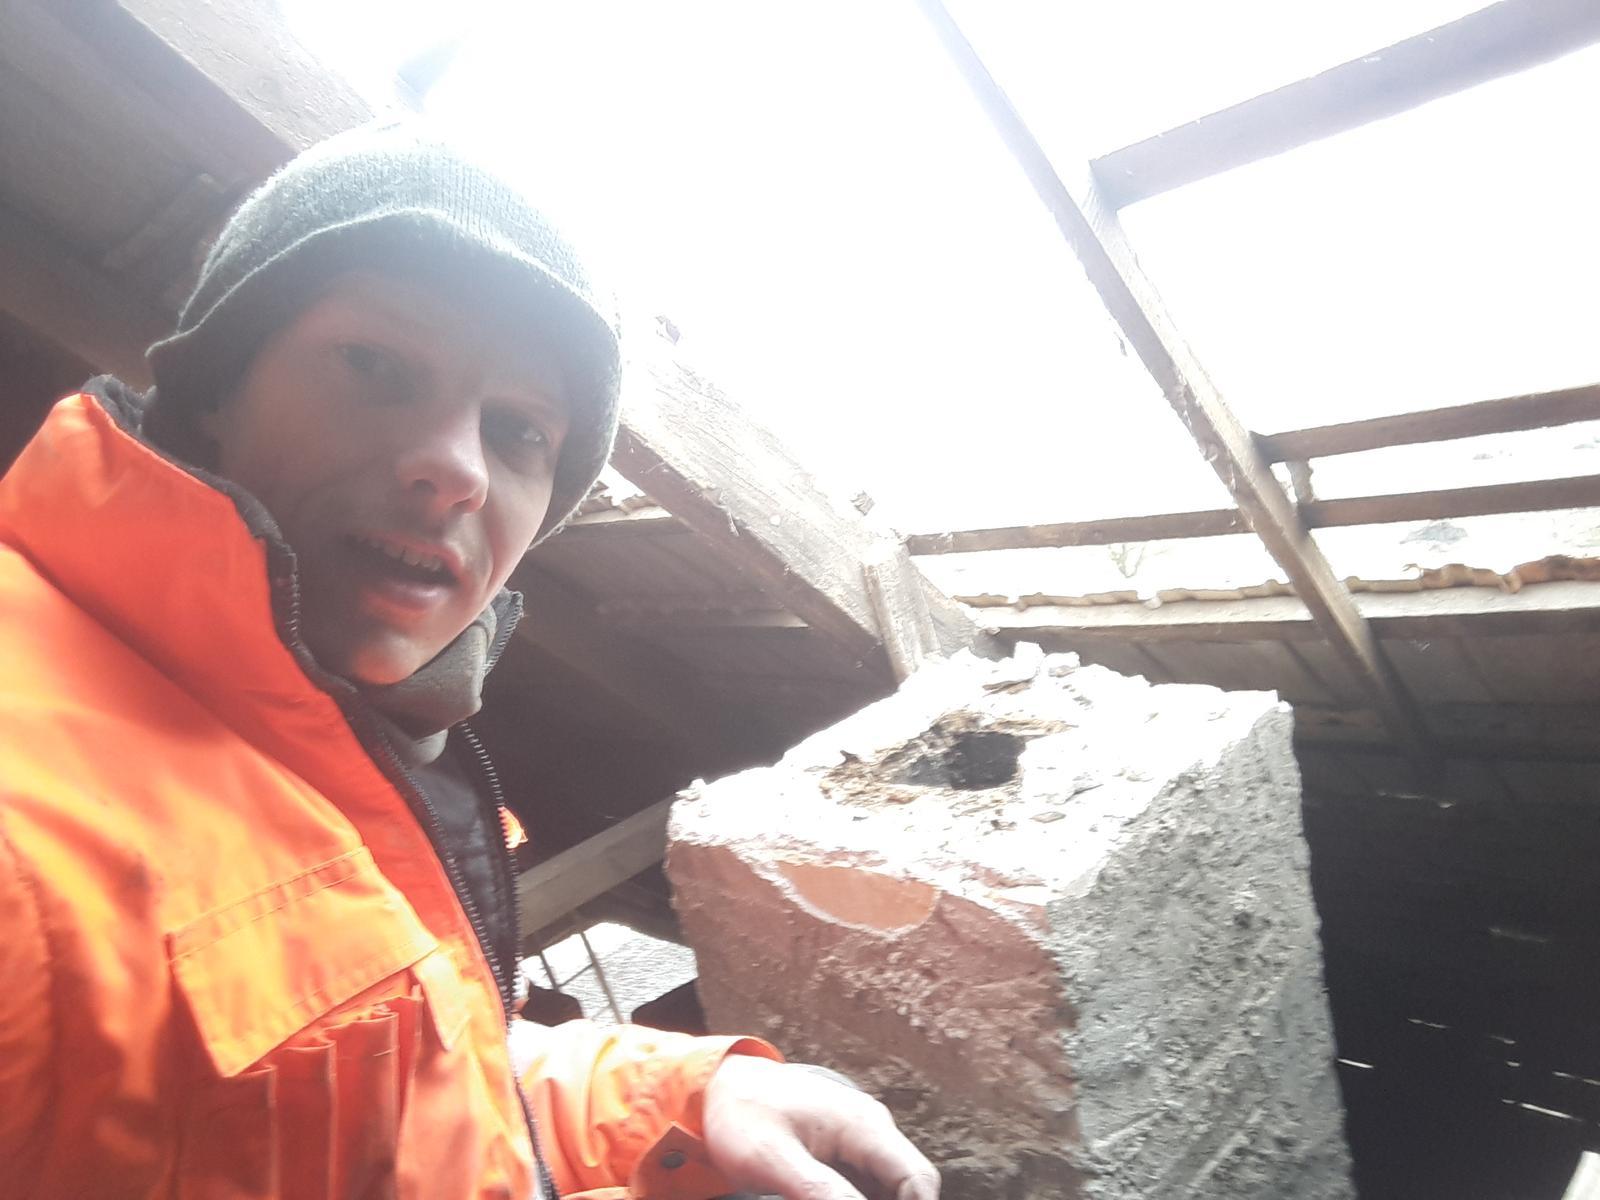 HACIENDA NAPOLI SEBECHLEBY - stare kominy som rozobral a tehlu odlozil